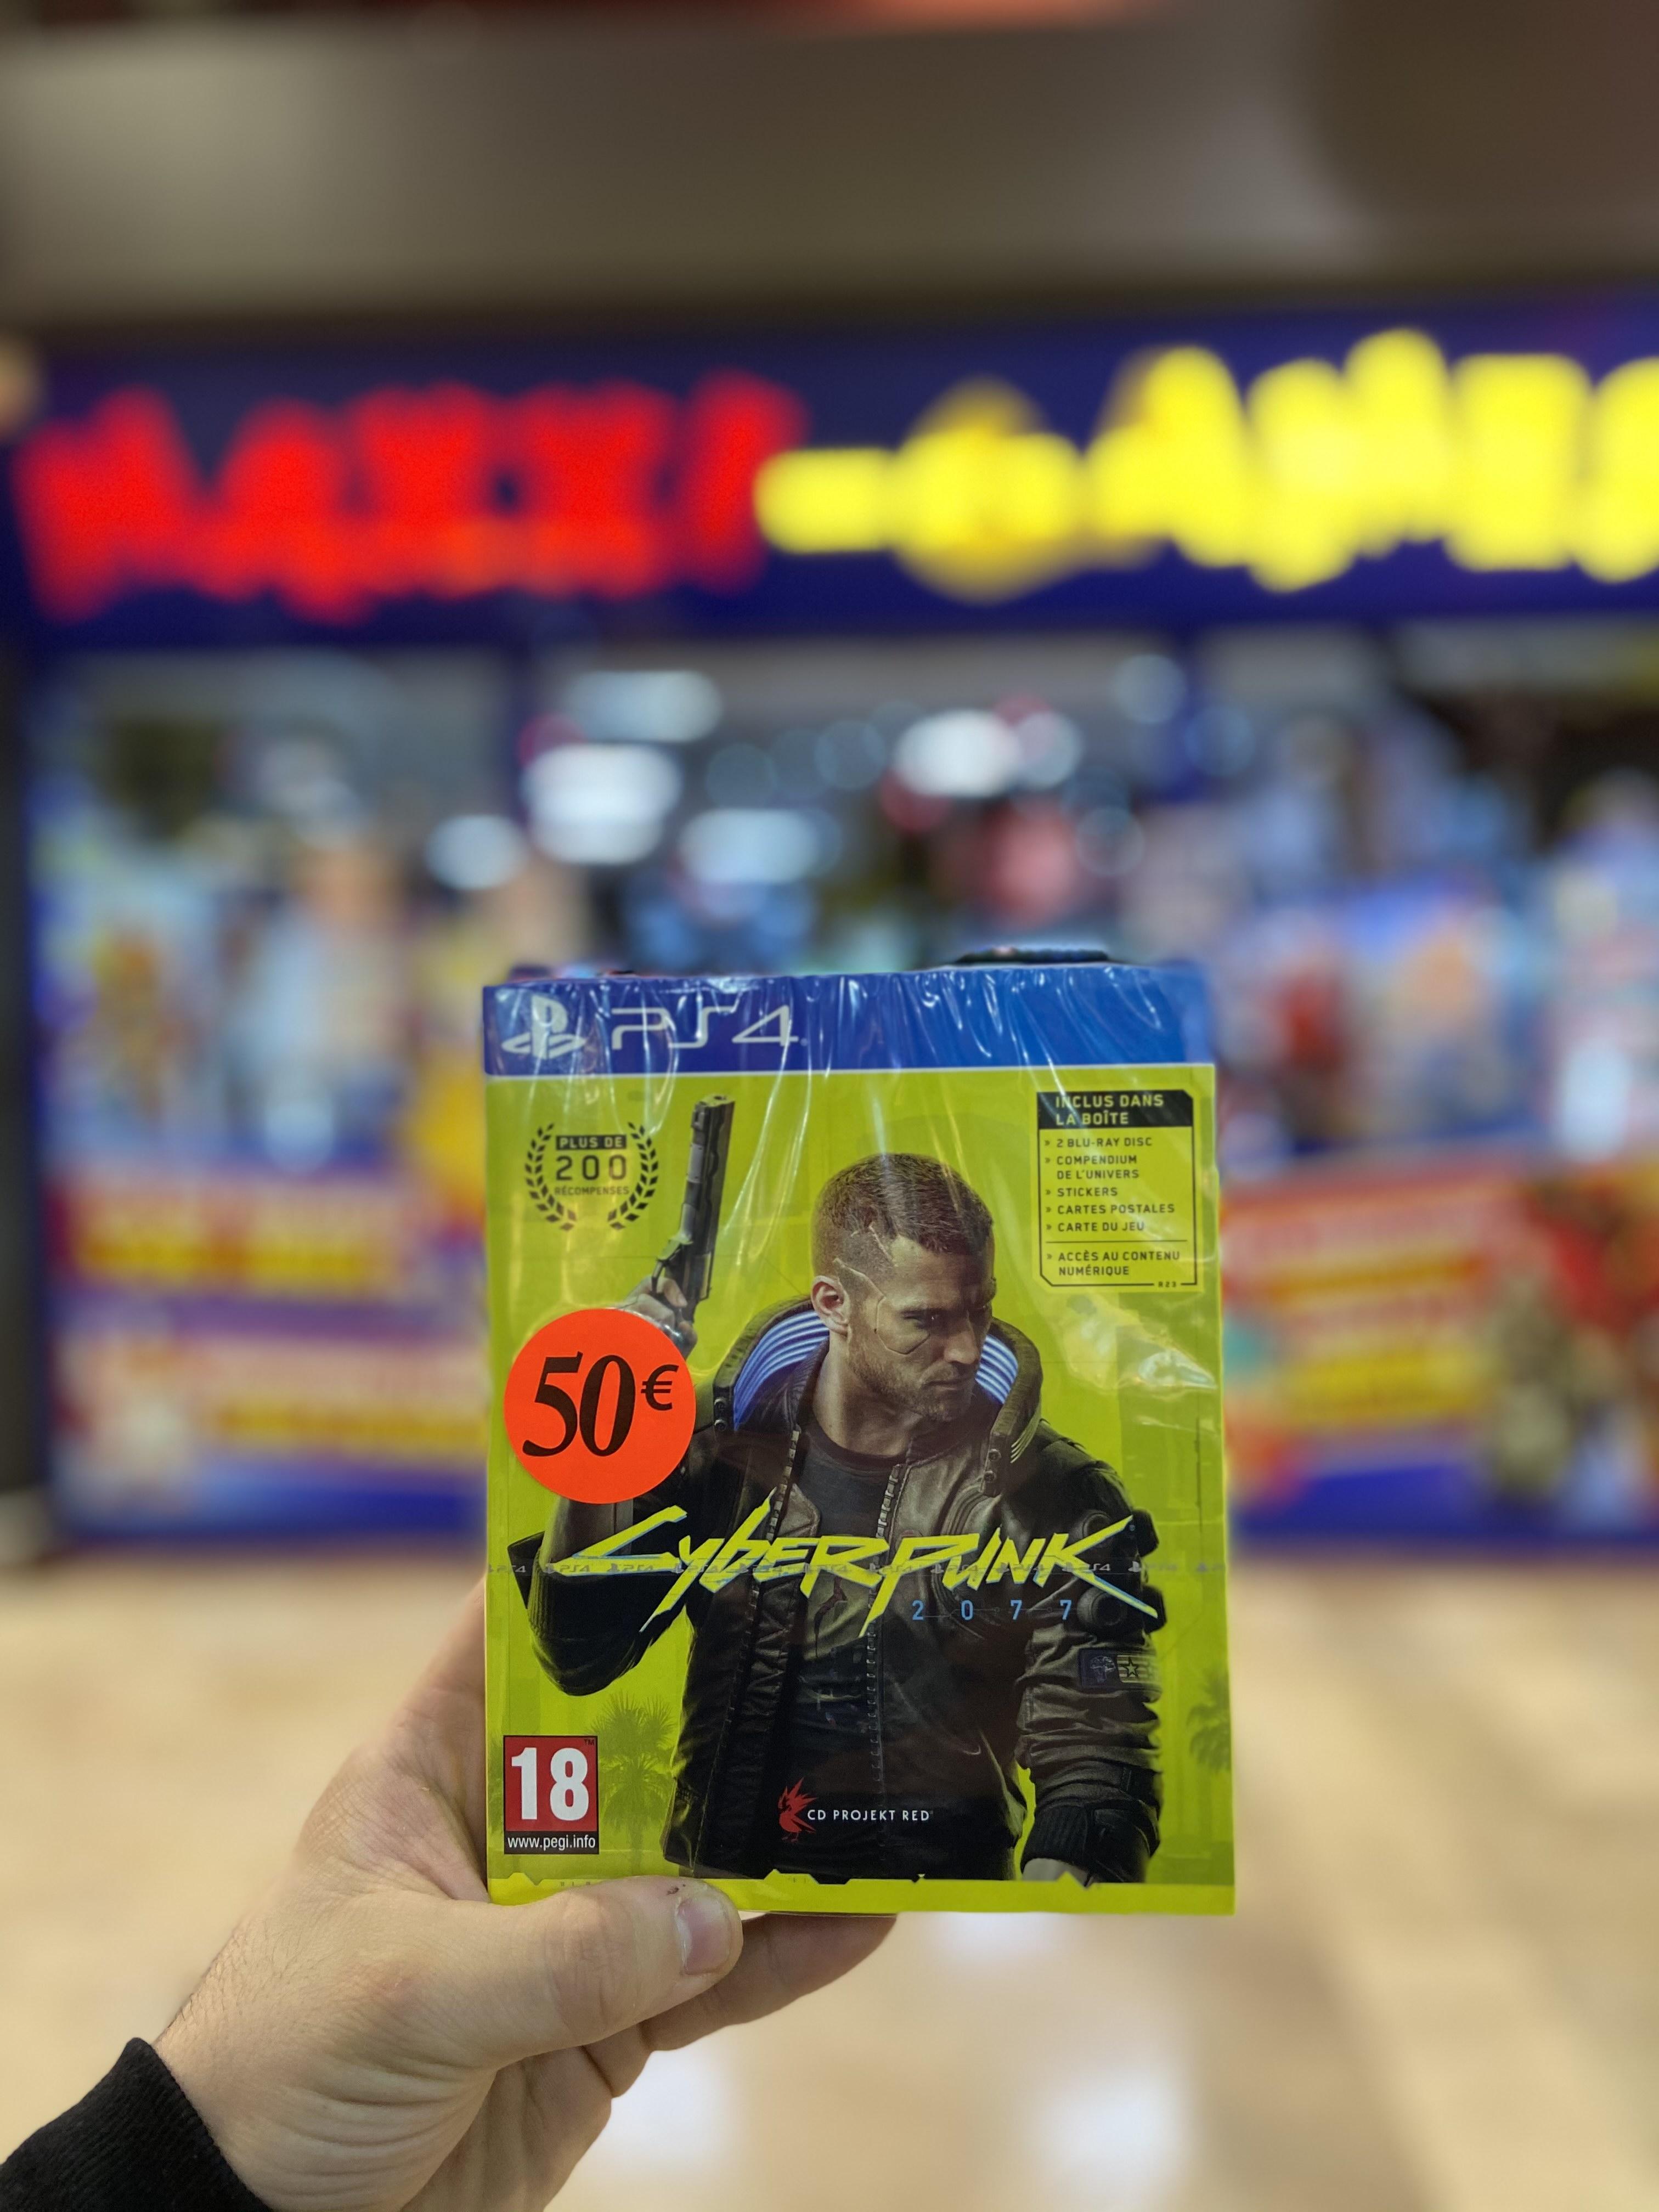 Cyberpunk sur PS4 - Maxxi Games Bagnolet (93)